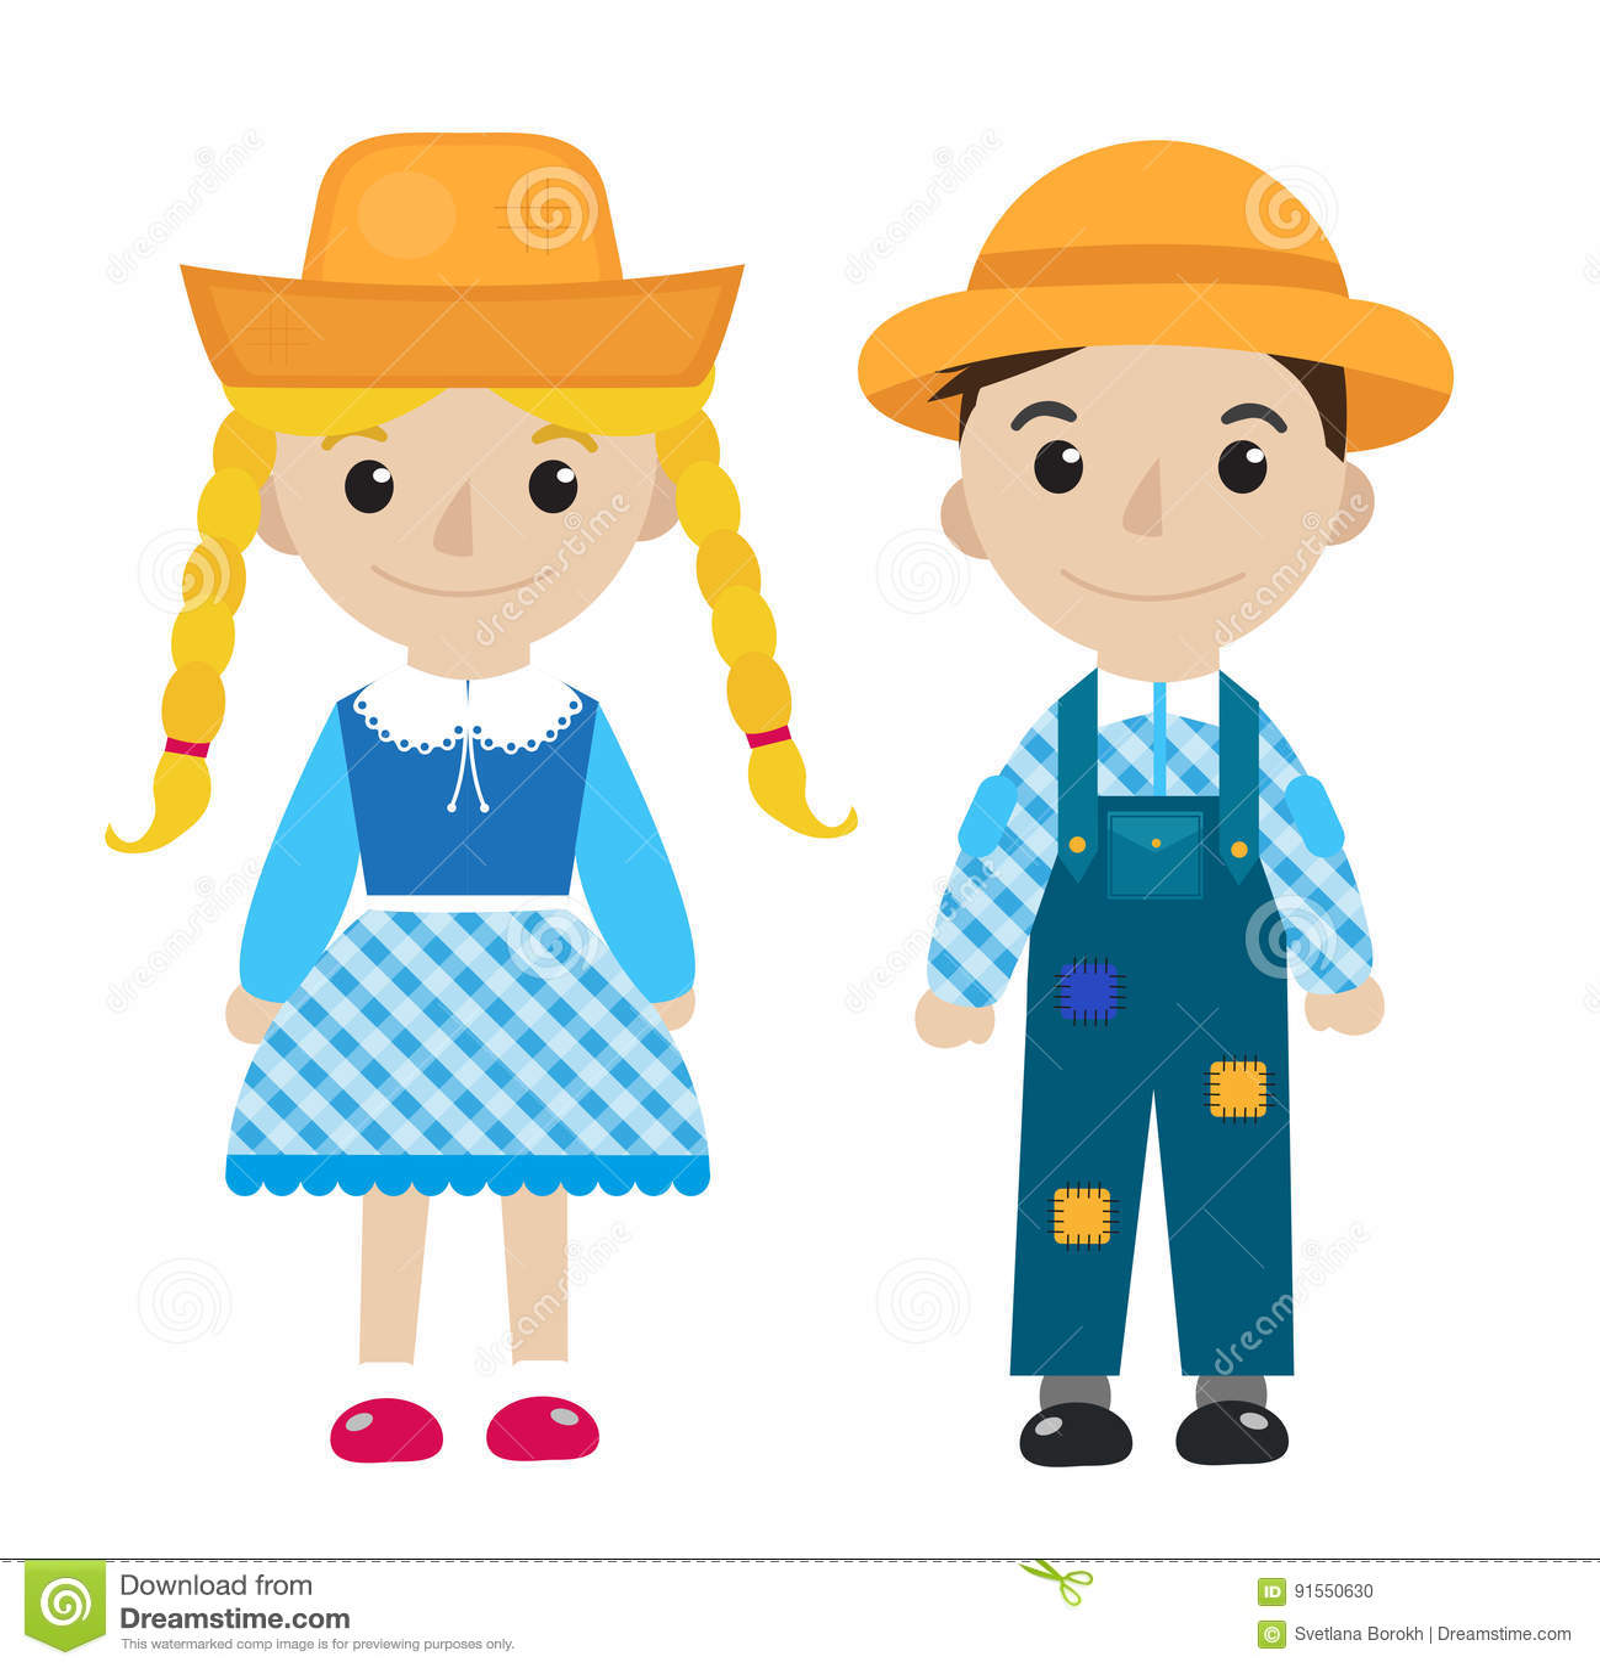 Festa Junina Girl And Boy In Traditional Festive Costume Icon Flat